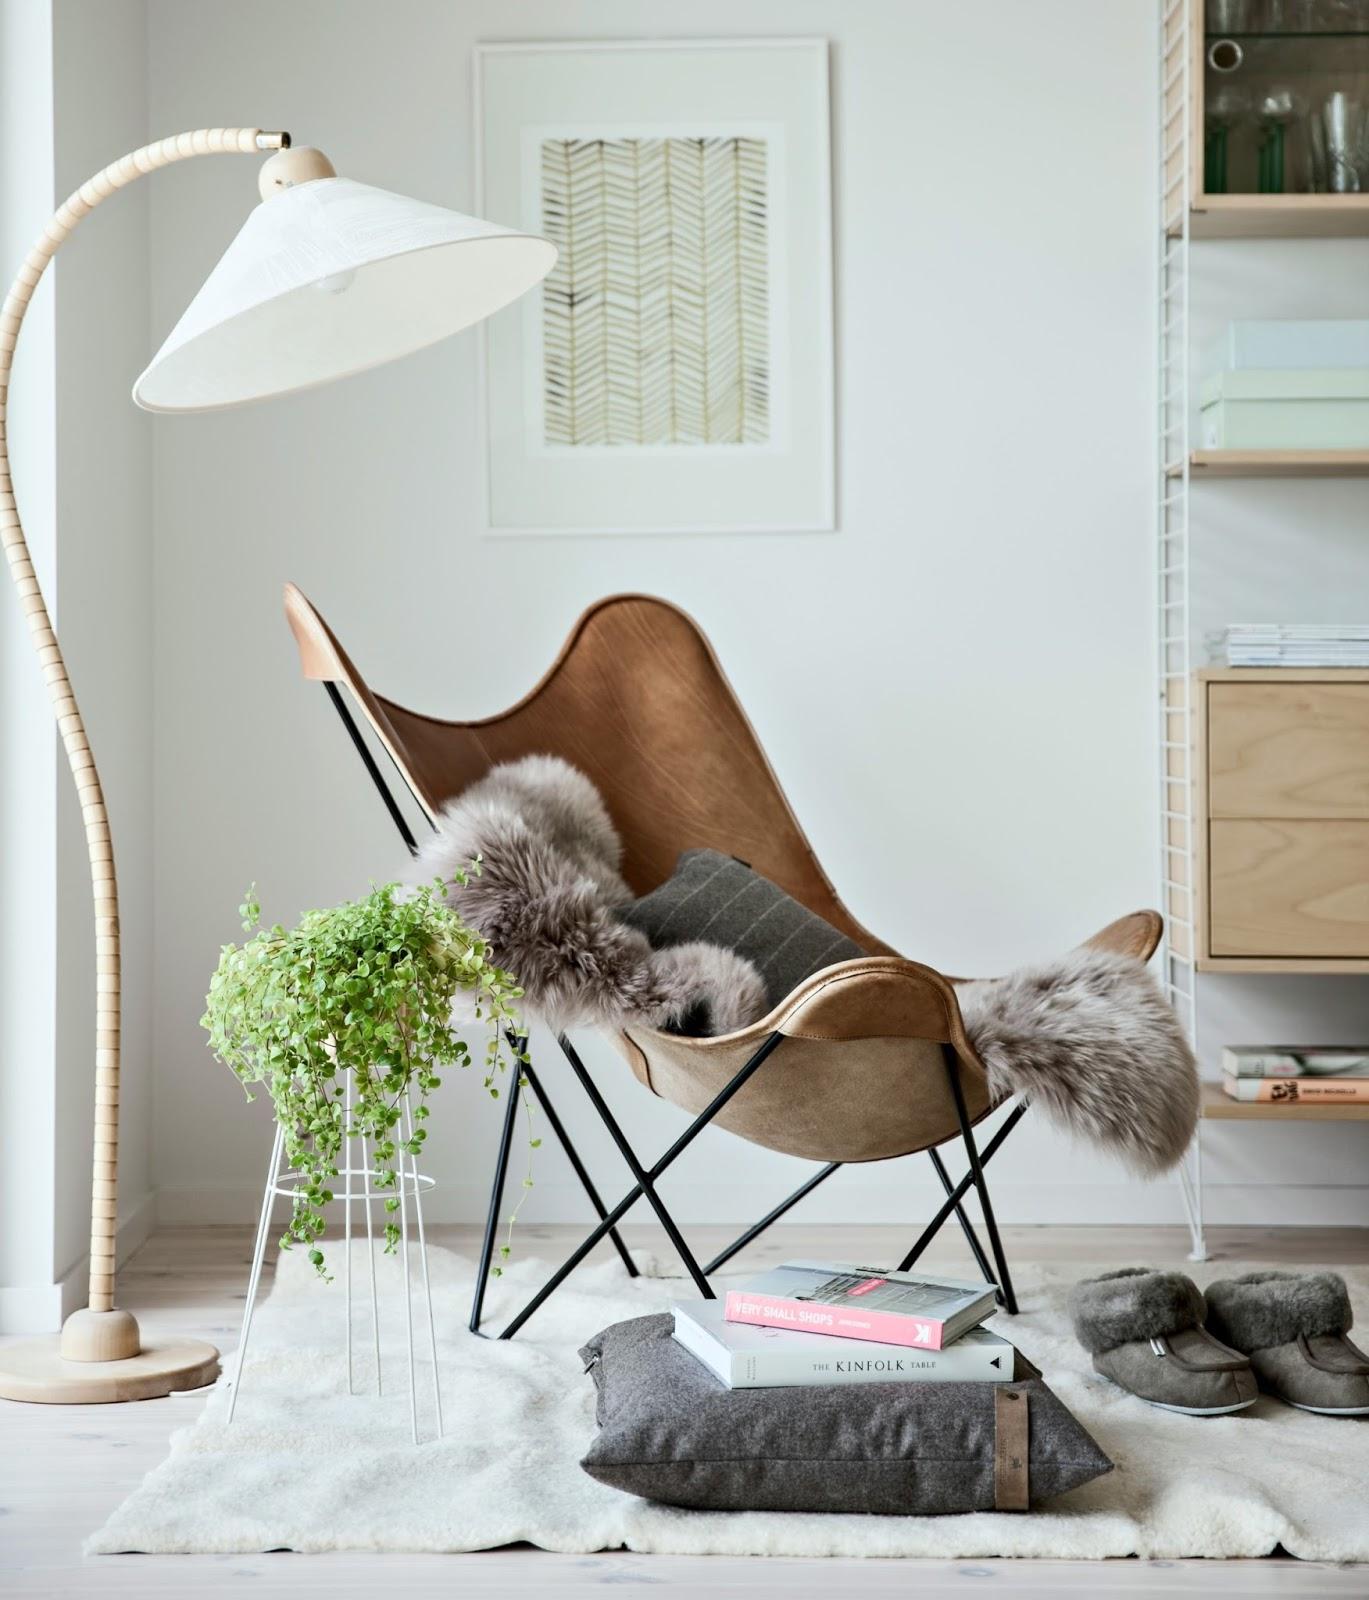 Shepherd of Sweden Collection